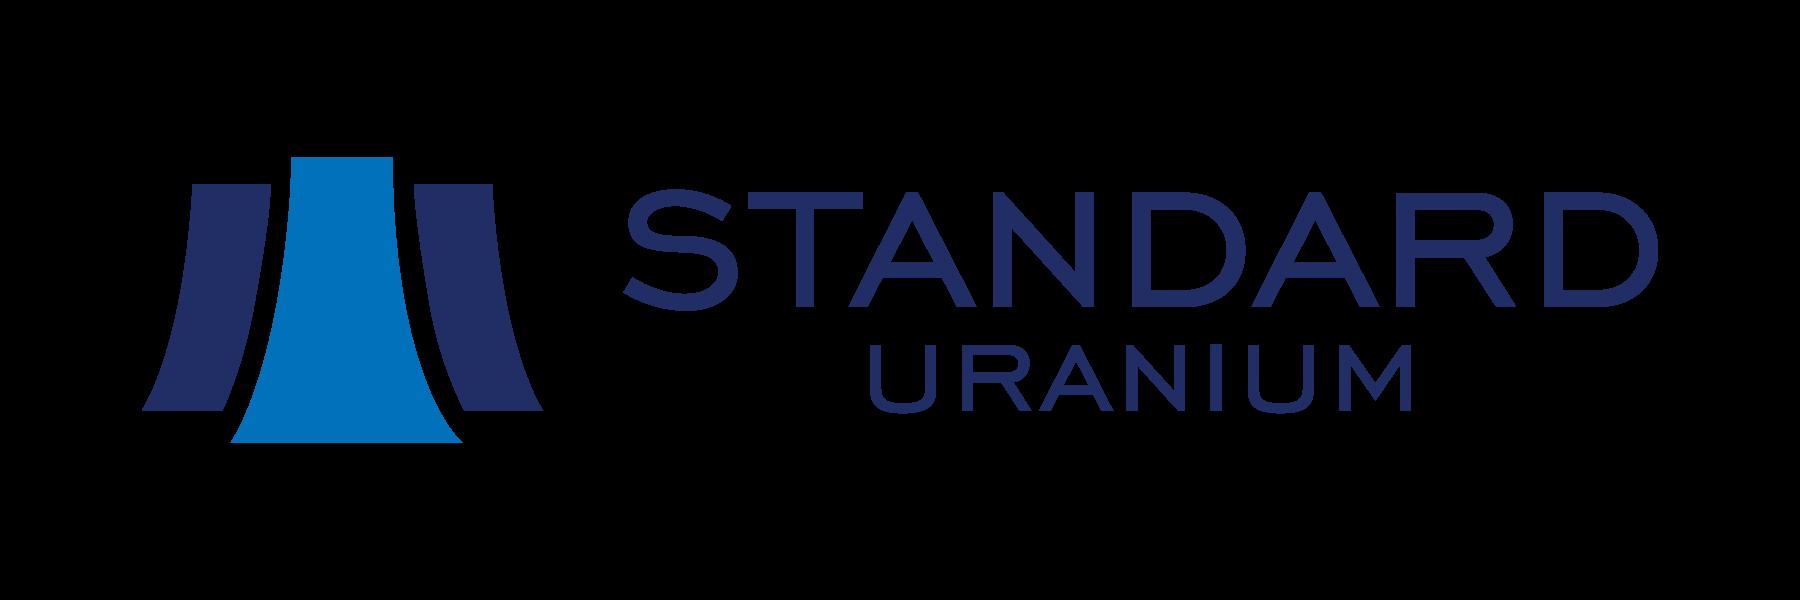 Standard Uranium Confirms Plans for Upcoming 5,000m Drill Programat its Flagship Davidson River Project